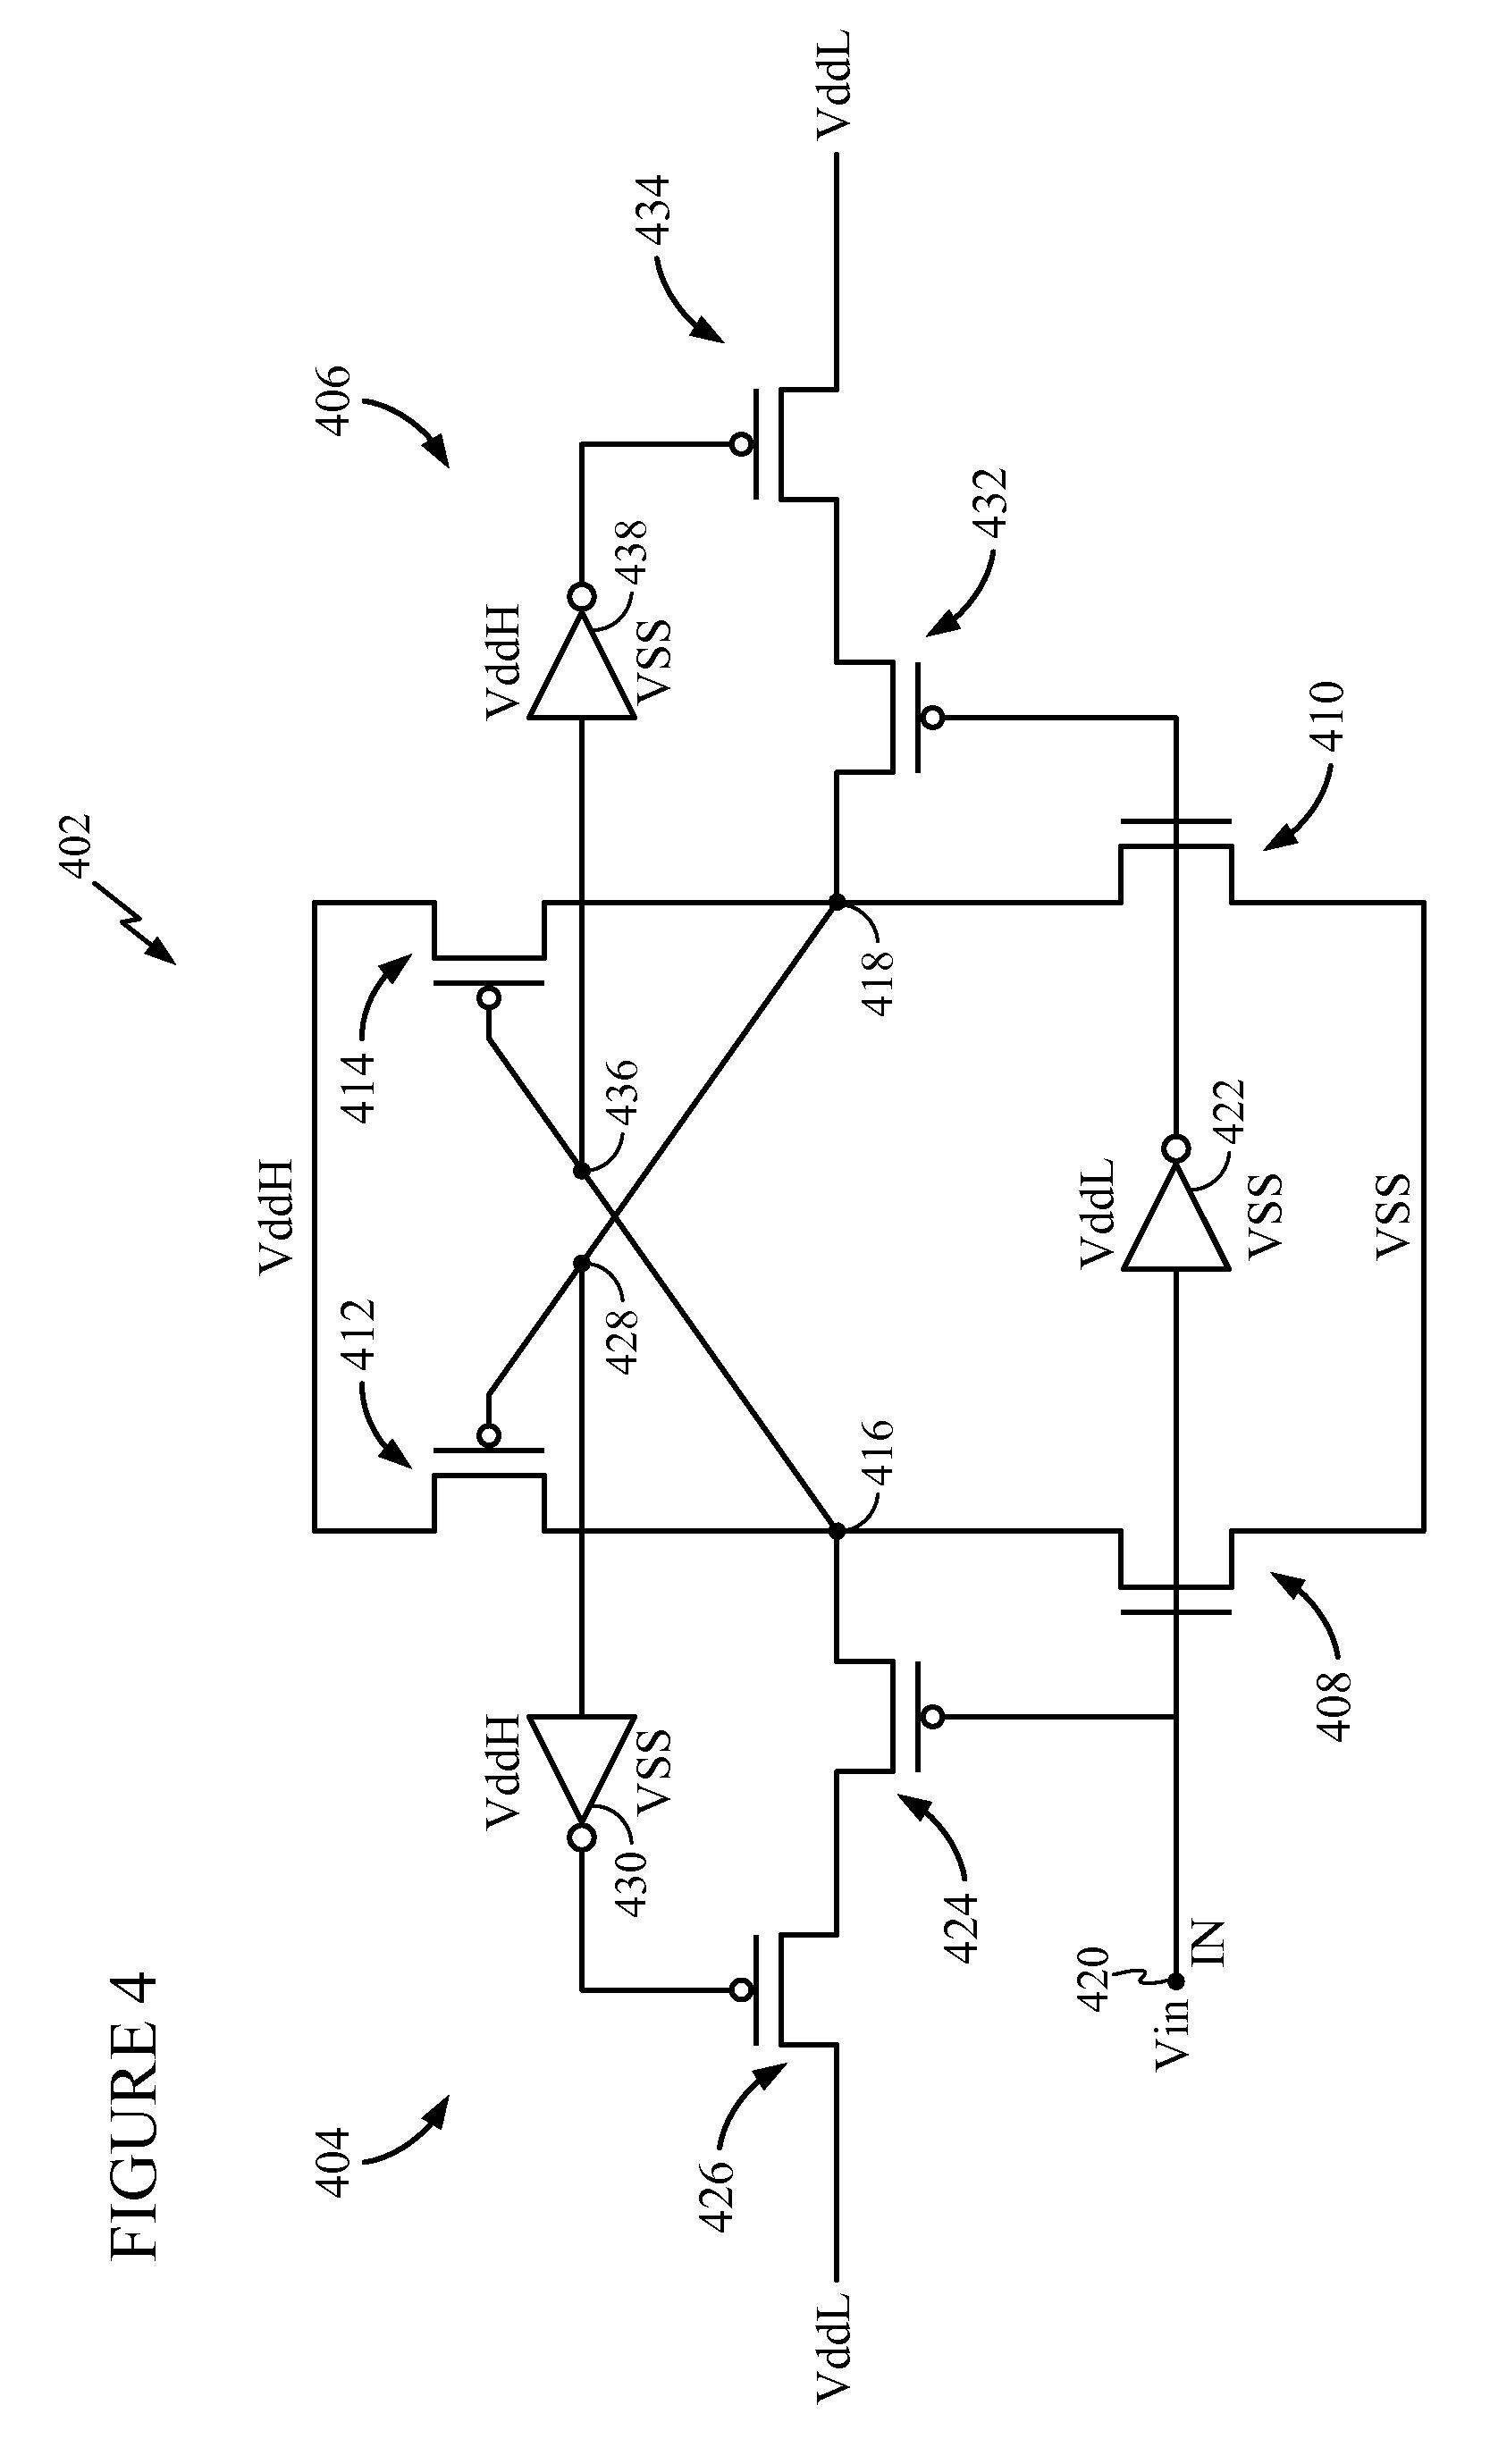 patente us7710183